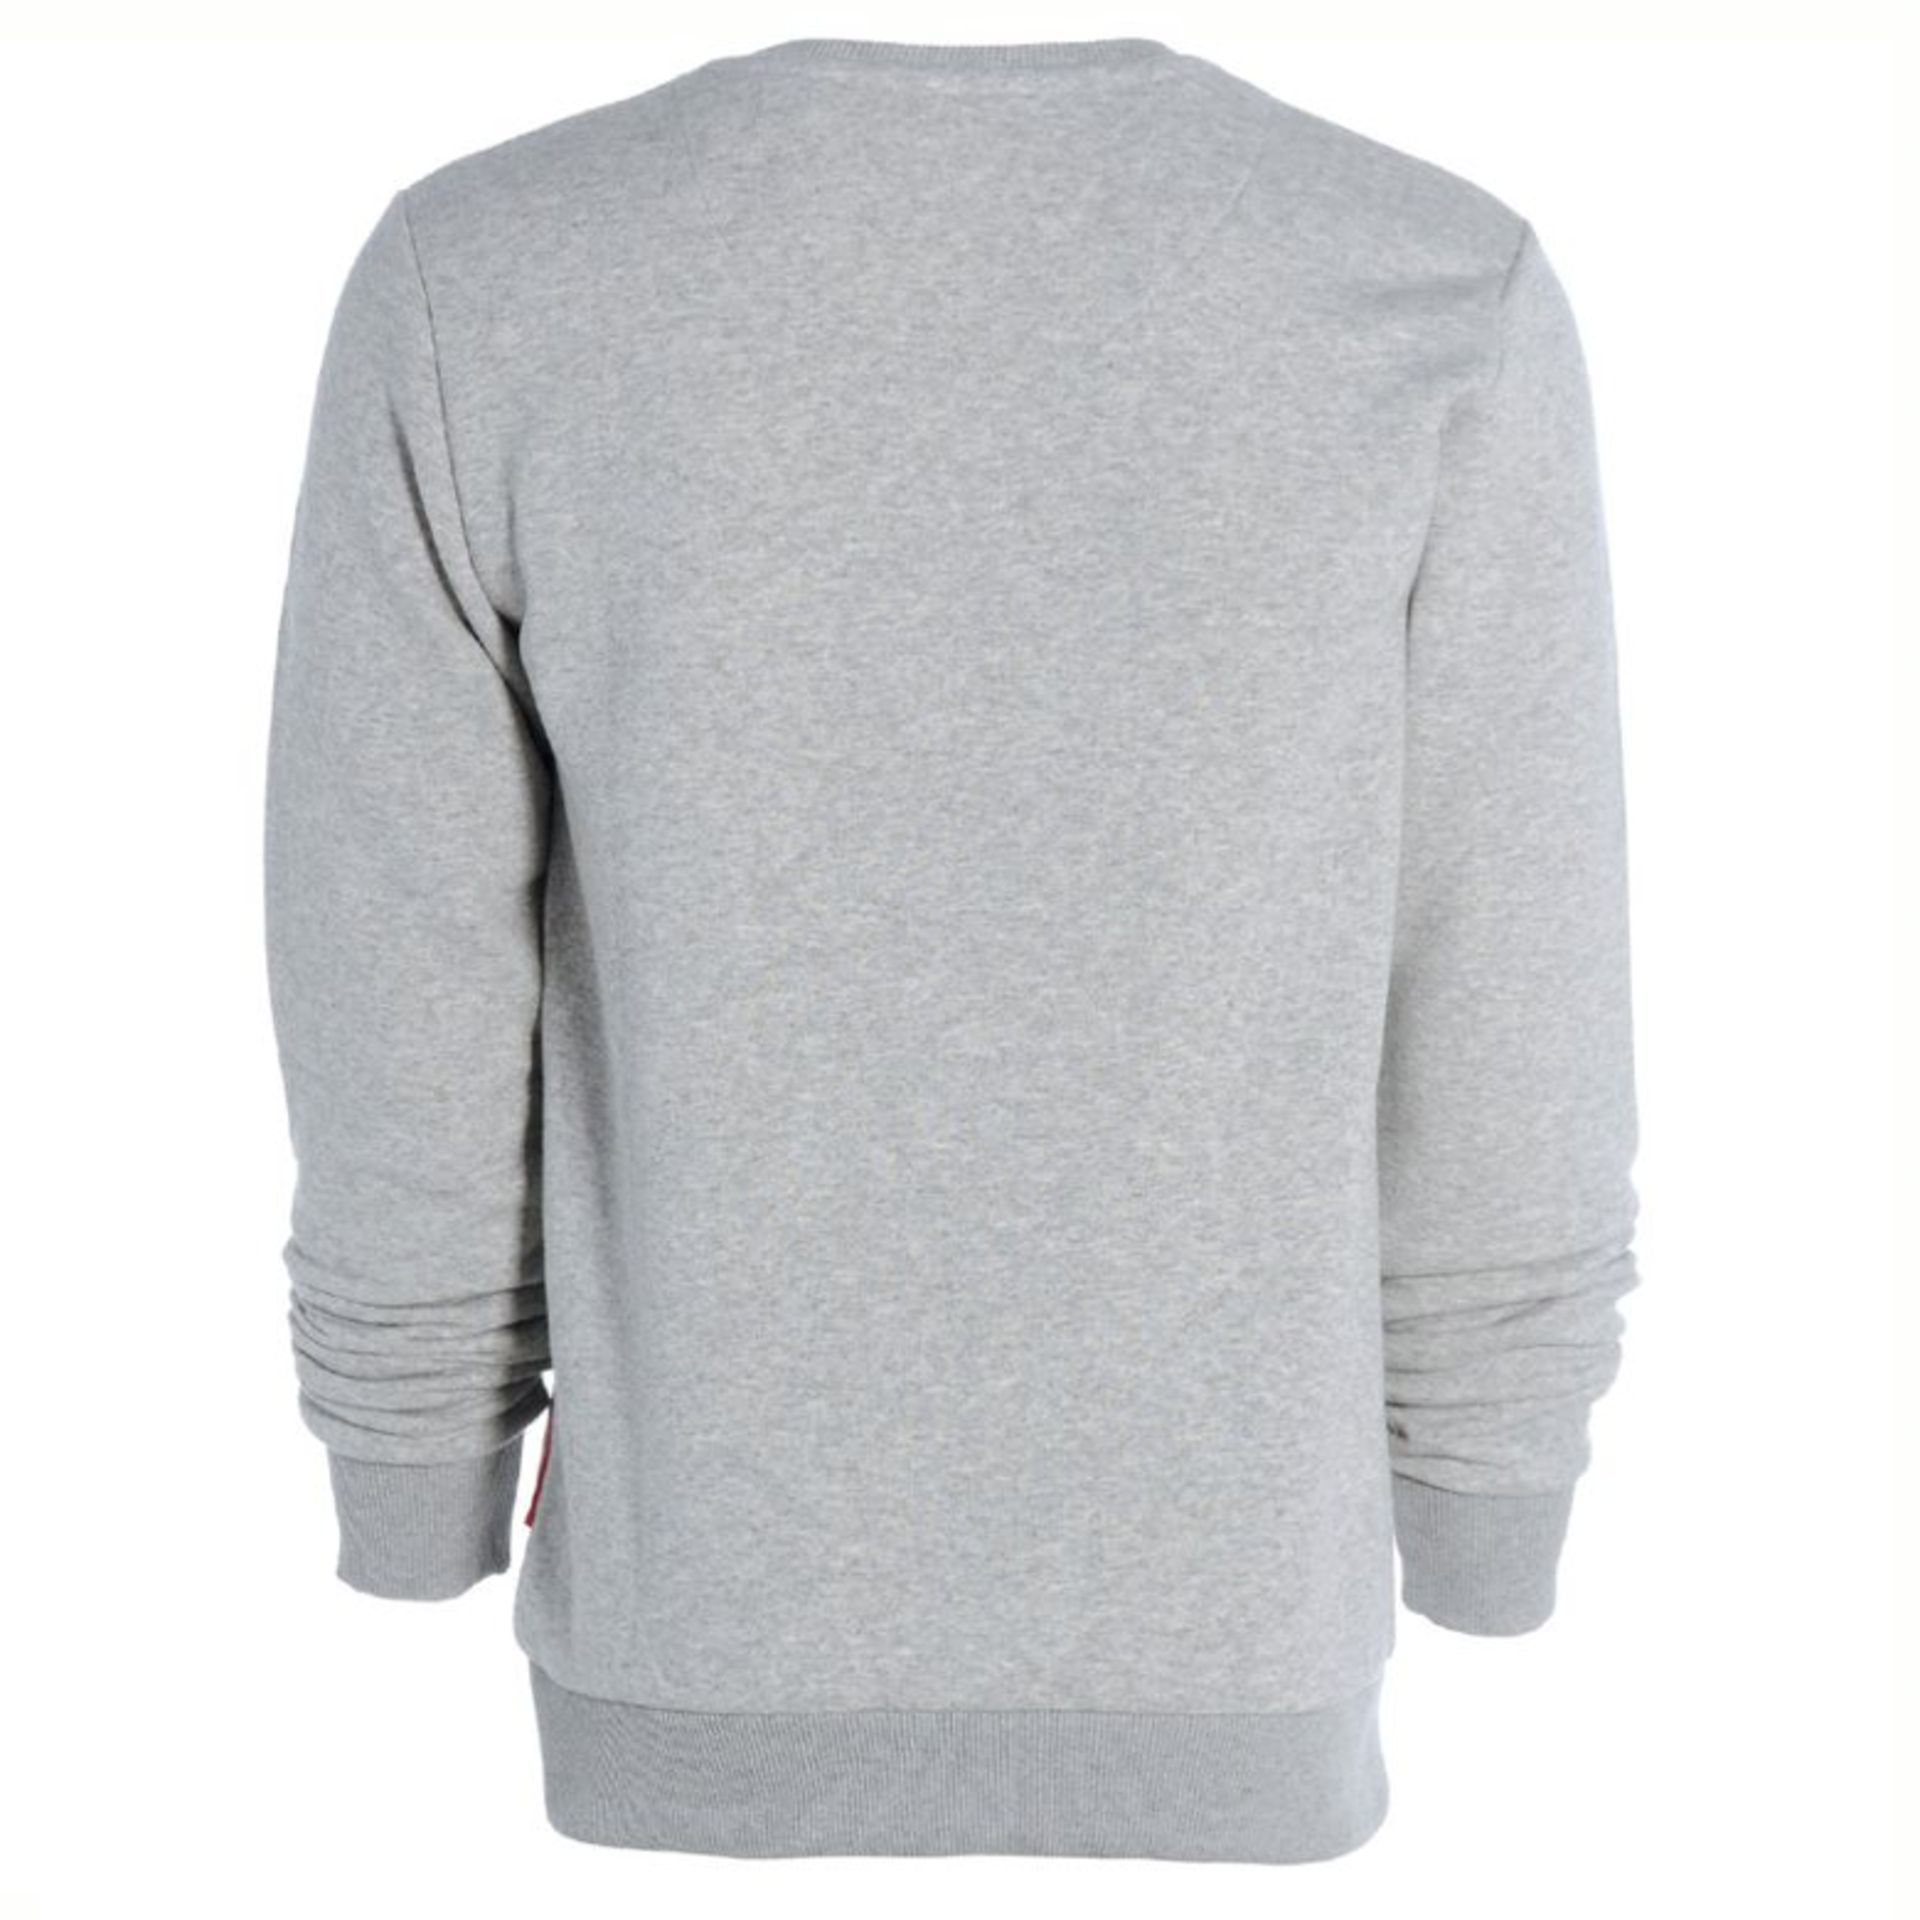 Criminal Damage Men's Sweater - Image 2 of 2